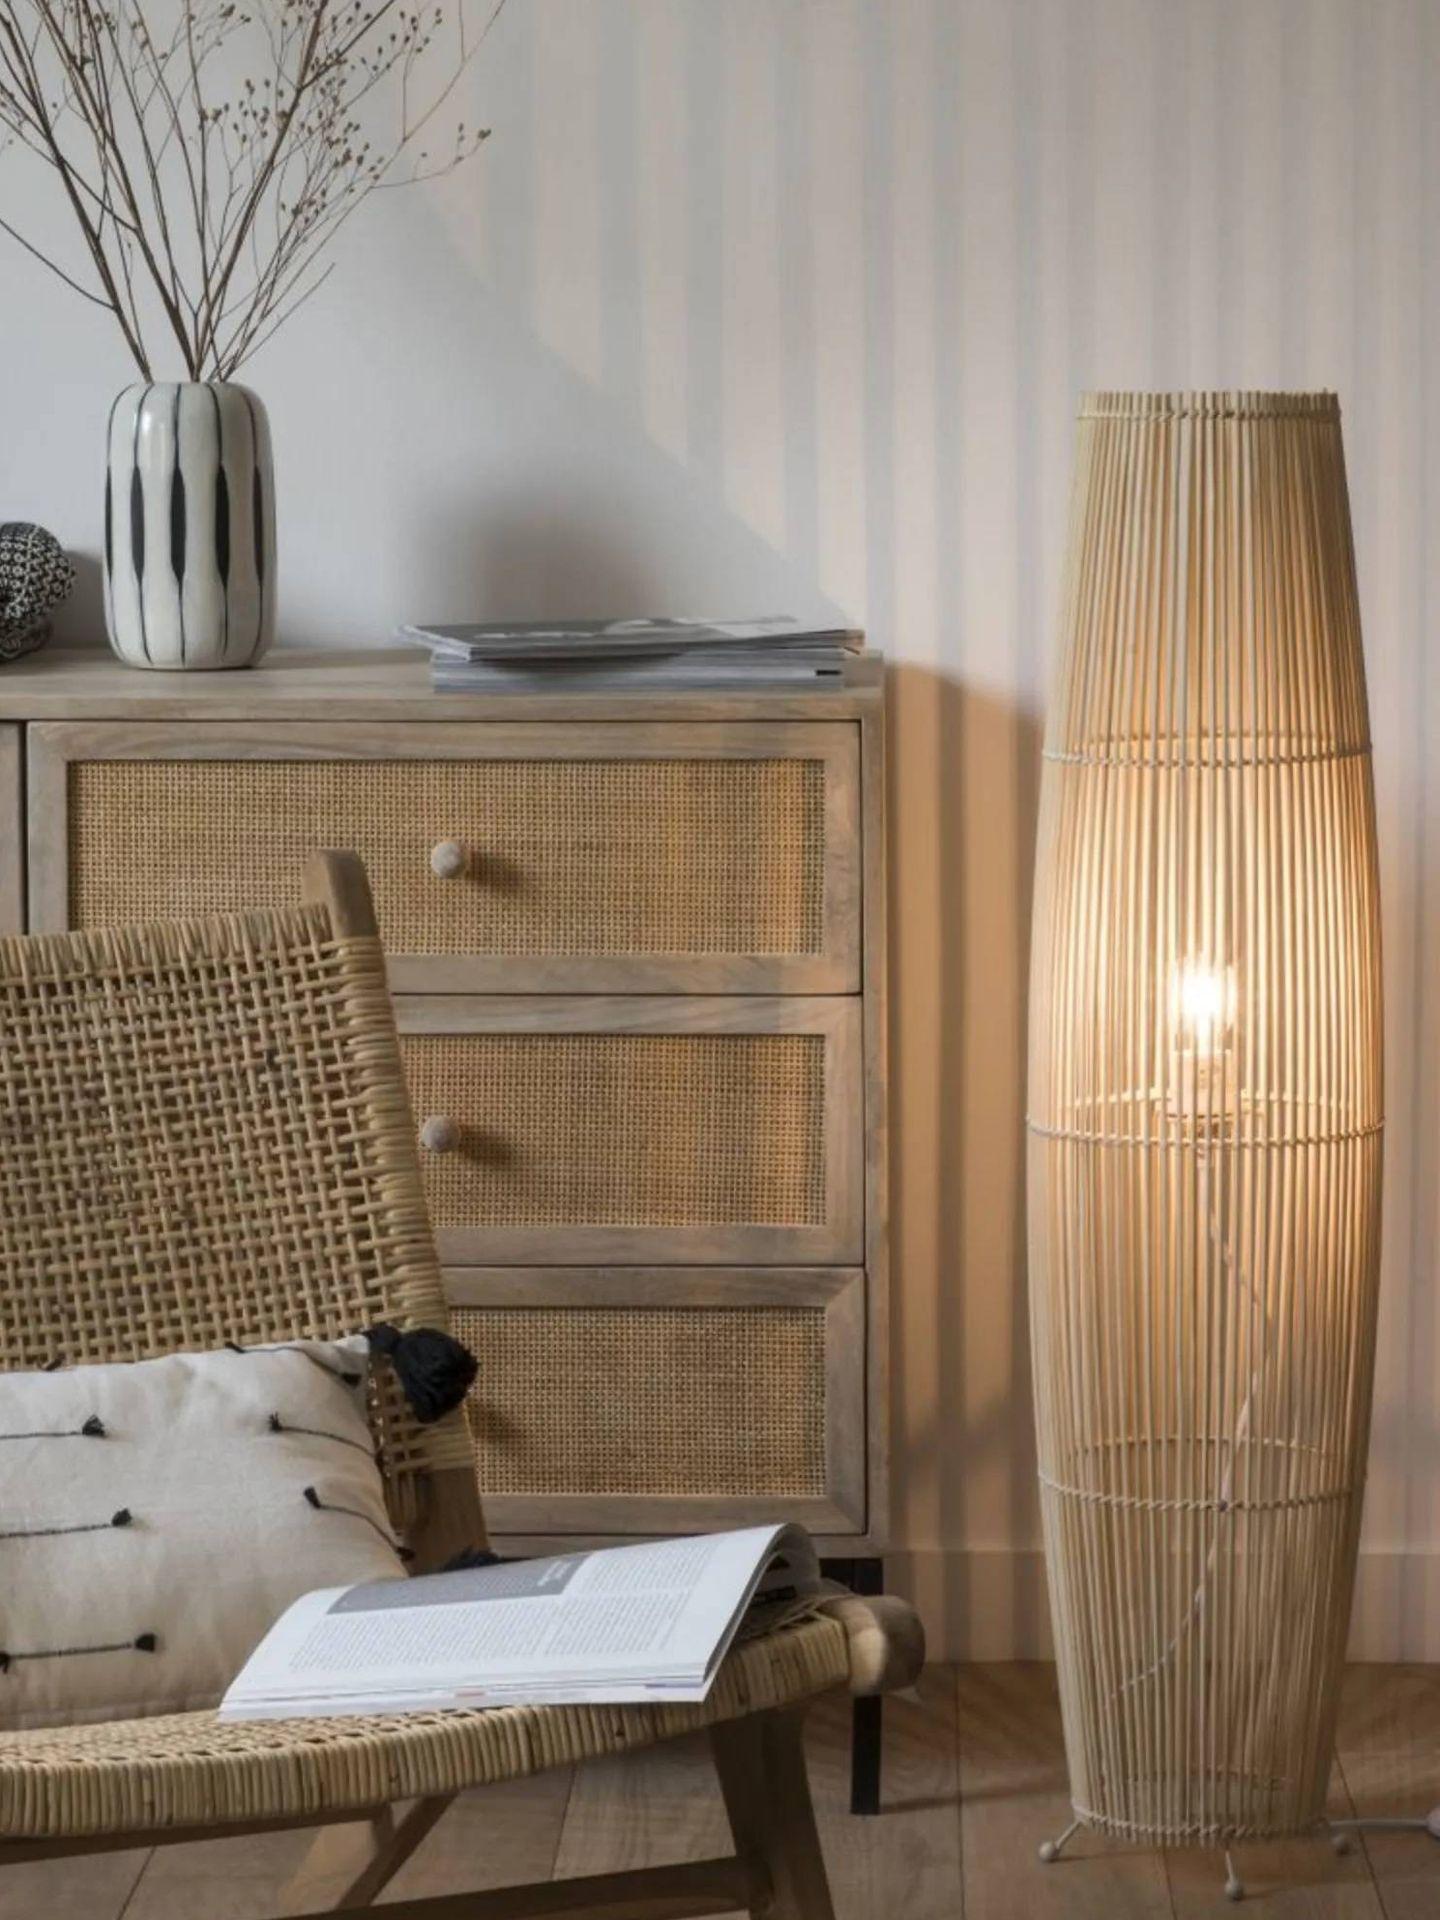 Ilumina tu estancia con estas lámparas de pie de Maisons du Monde. (Cortesía)